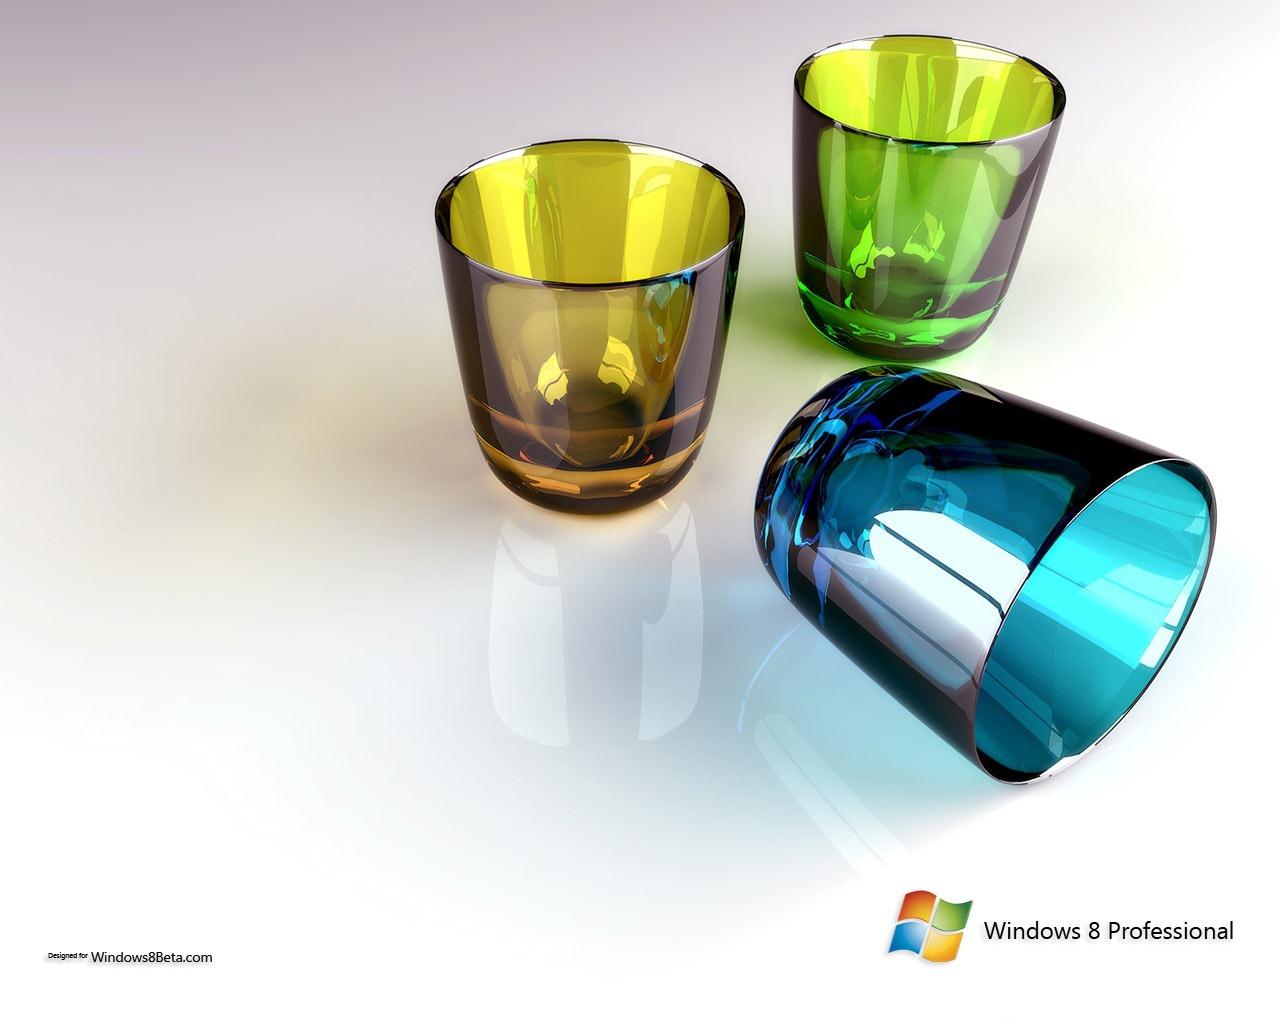 https://4.bp.blogspot.com/-2WlEZVfYsLM/TfG1KkCahmI/AAAAAAAACE8/8-4Y5MAGf-0/s1600/Windows-8-wallpapers_5.jpg